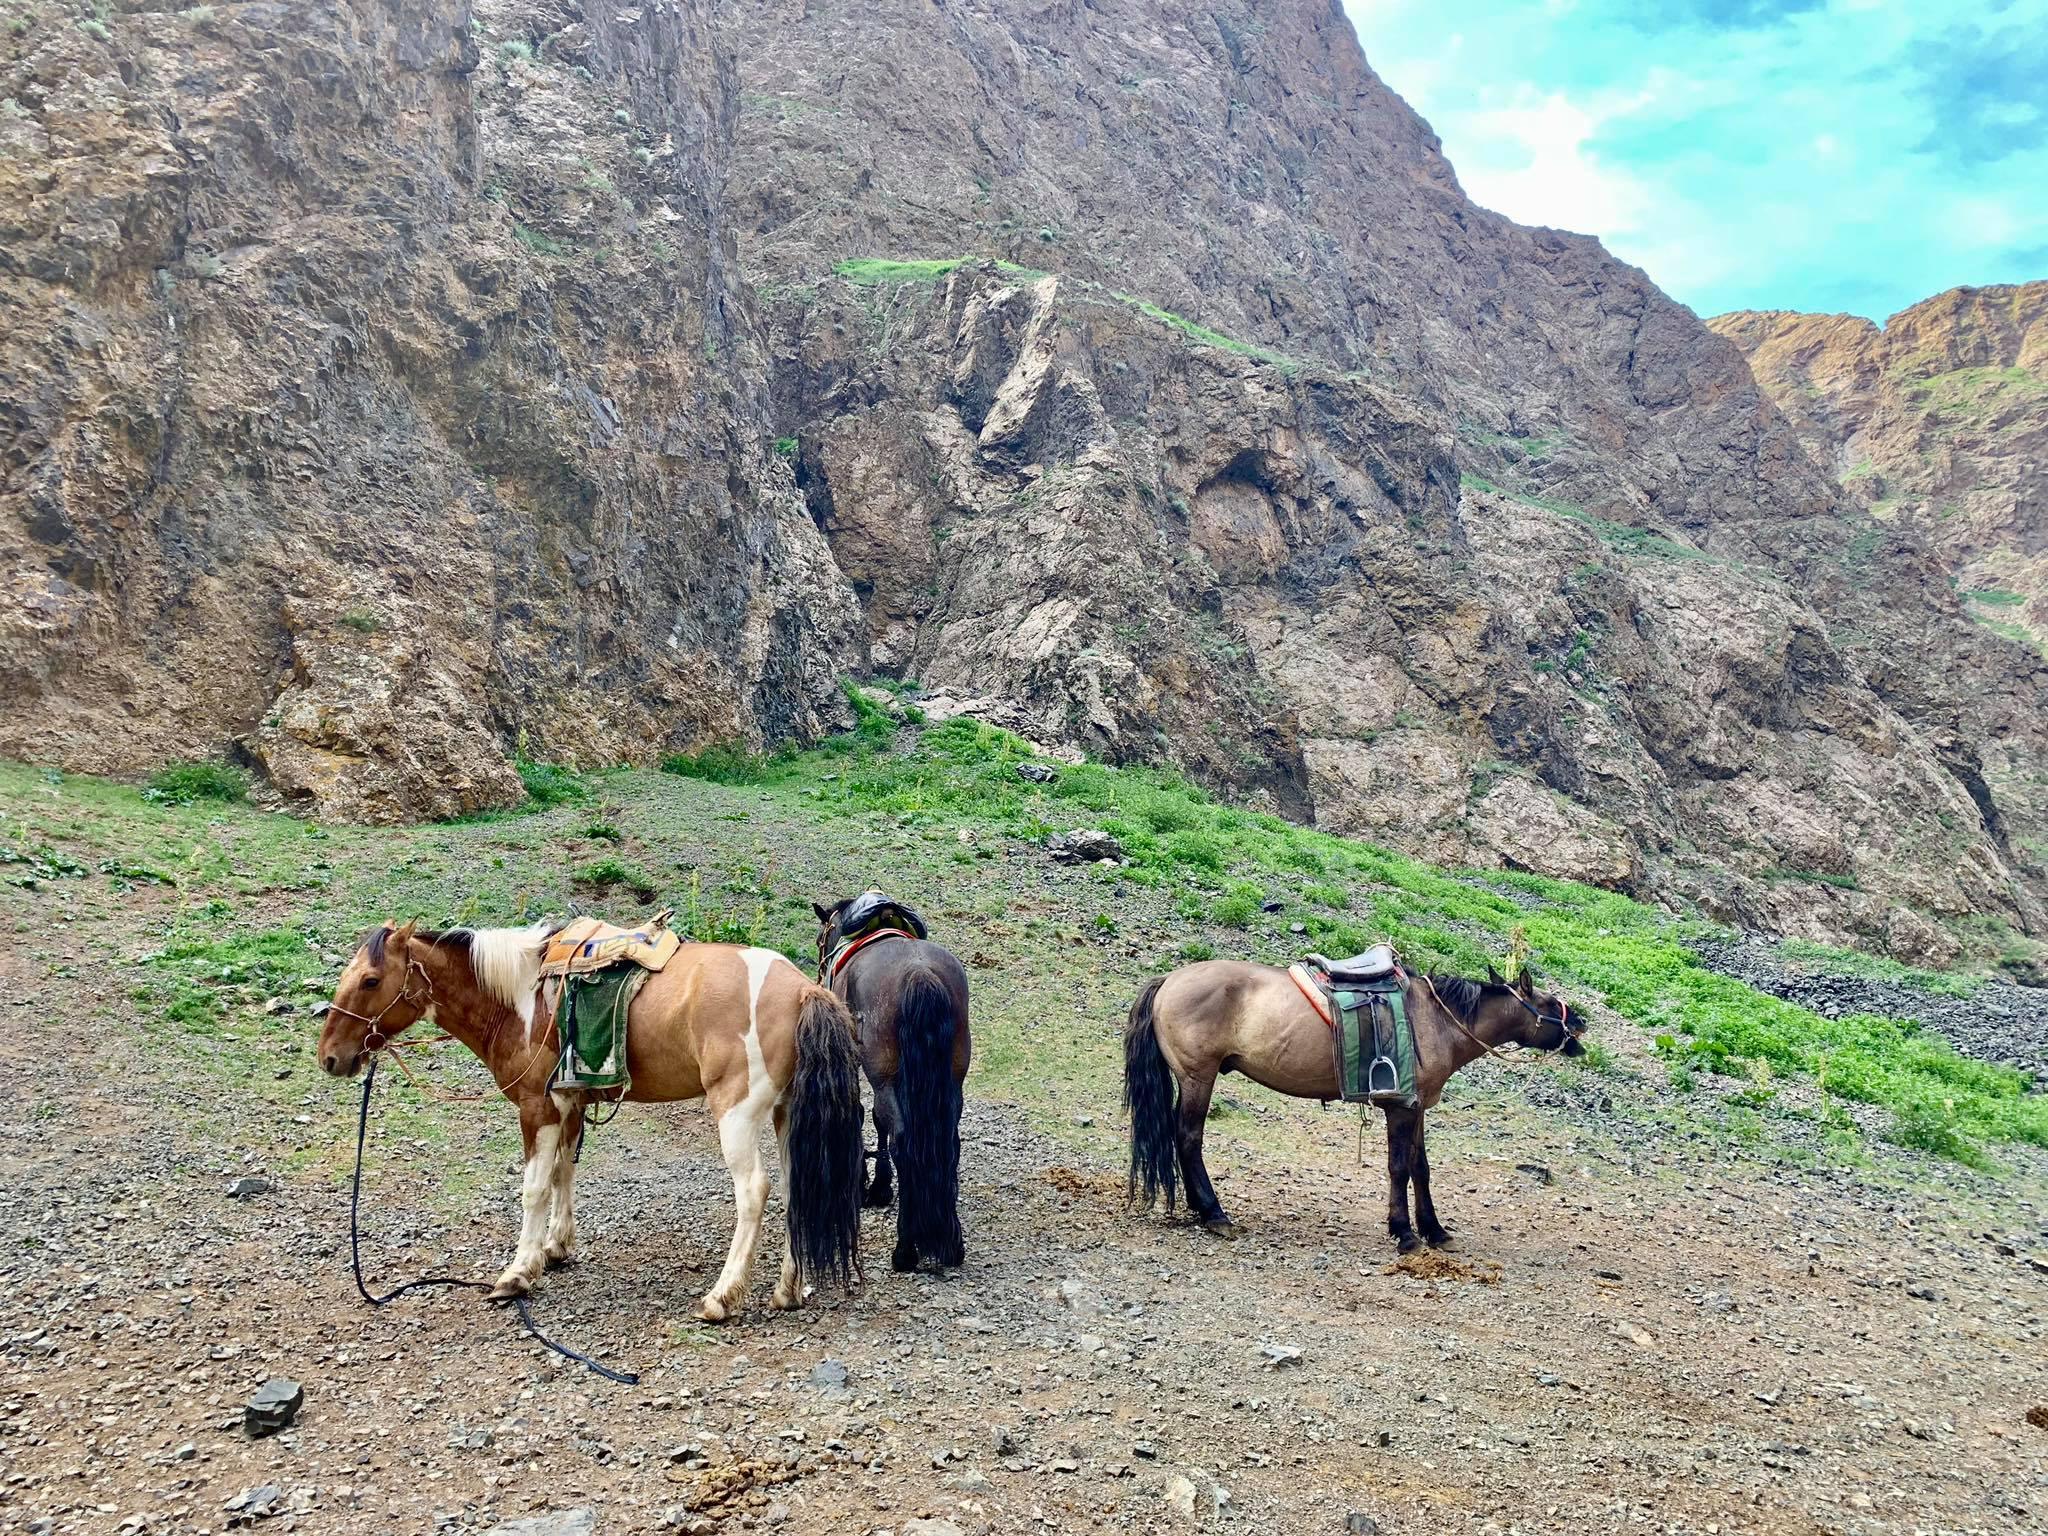 Kach Solo Travels in 2019 Horseback riding trip to the Gobi Gurvan Saikhan National Park19.jpg